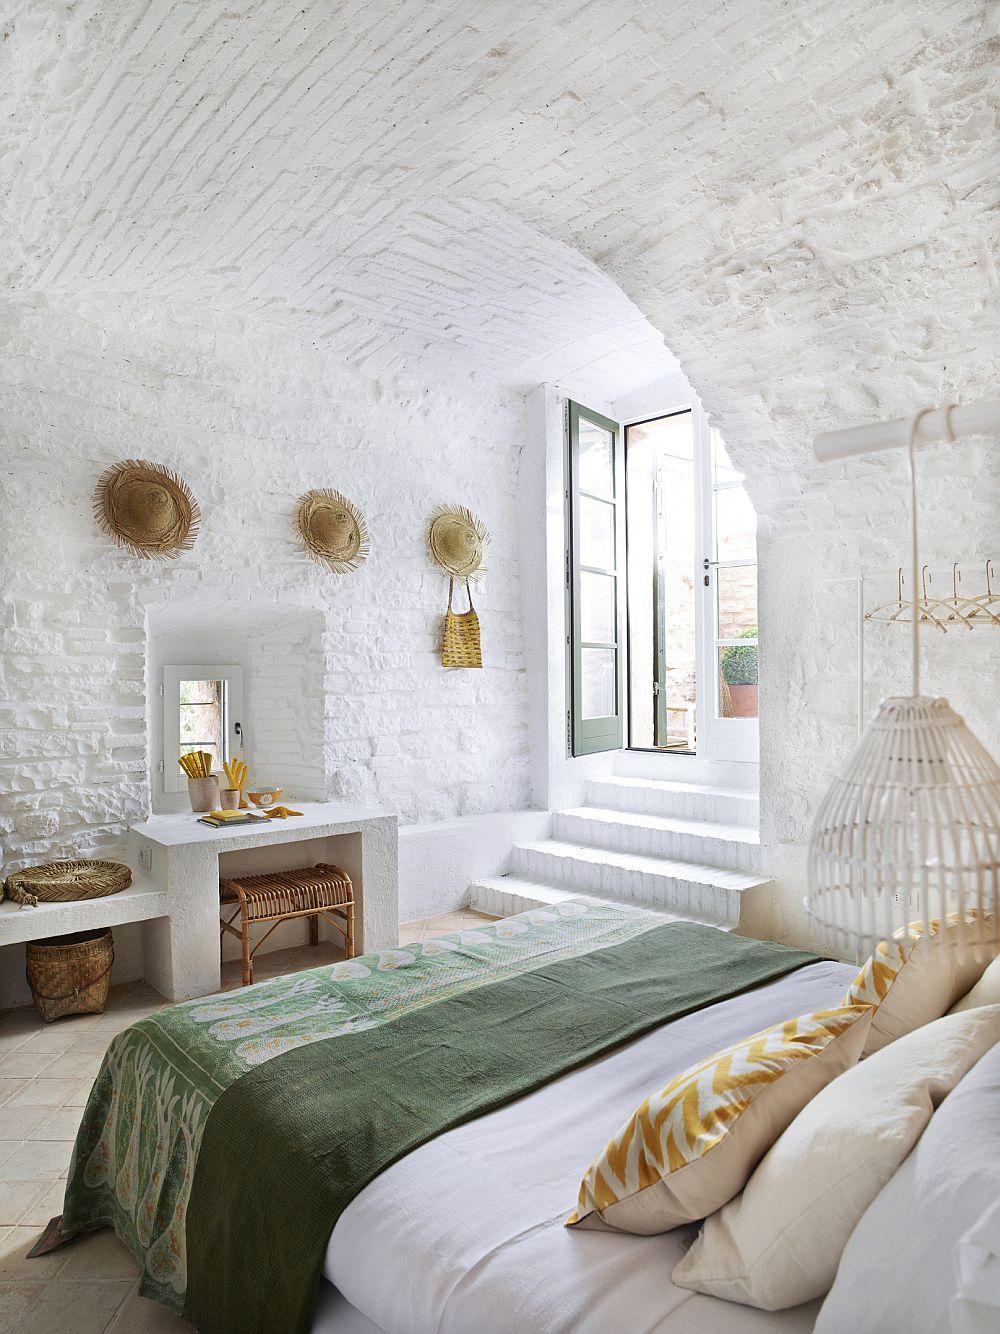 adelaparvu.com despre casa din piatra in stil eclectic, Umbria, designer Andrea Falkner, Foto Septimius Krogh (19)